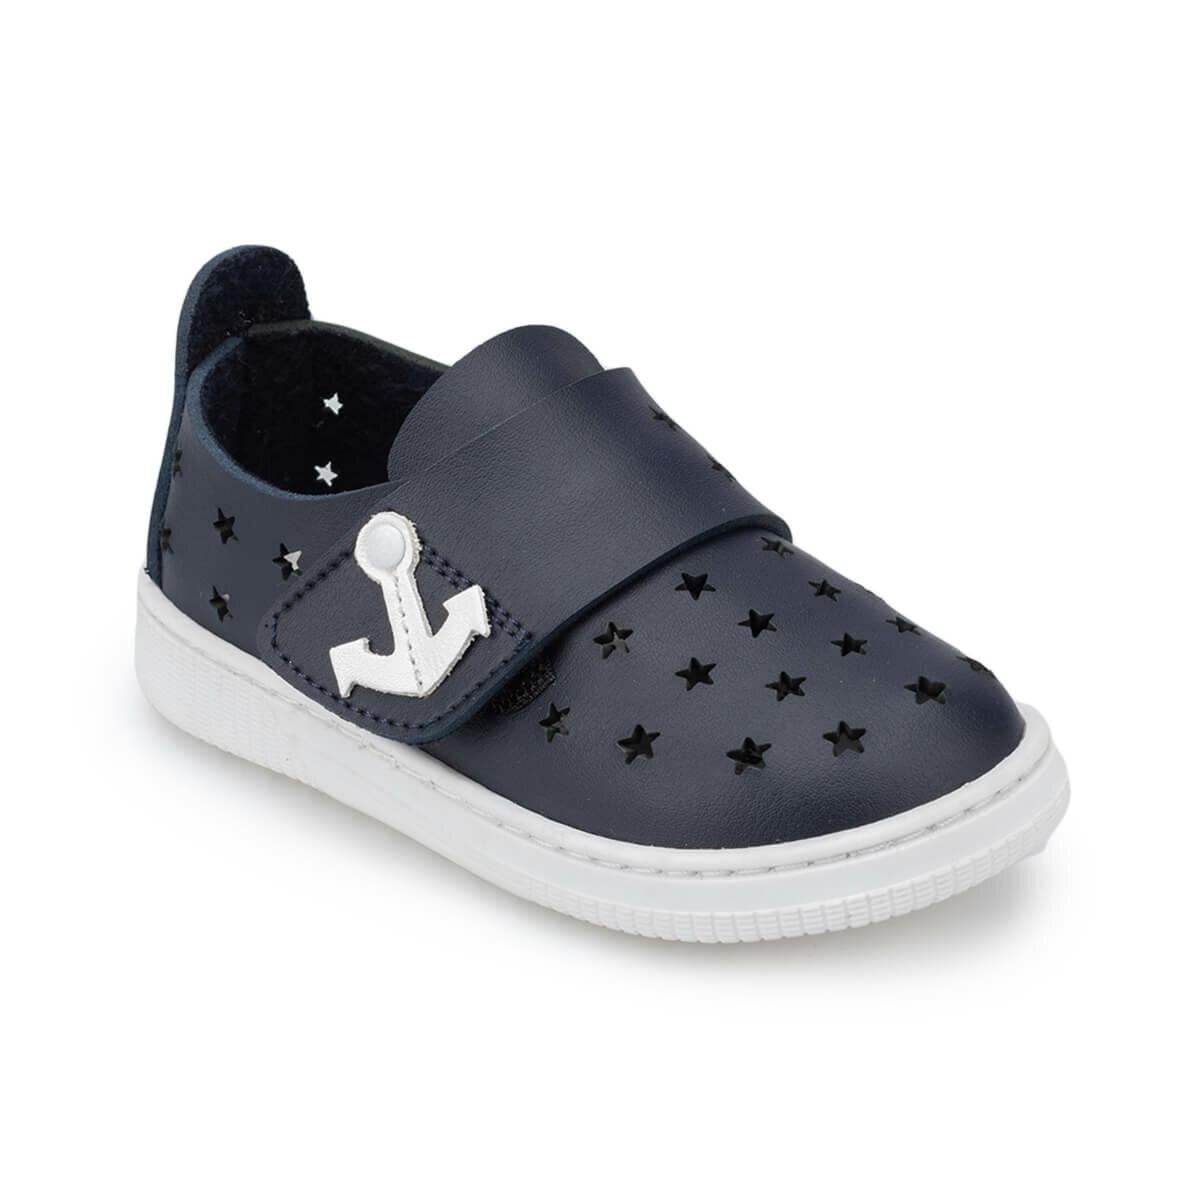 FLO 91.510270.B Navy Blue Male Child Sneaker Shoes Polaris